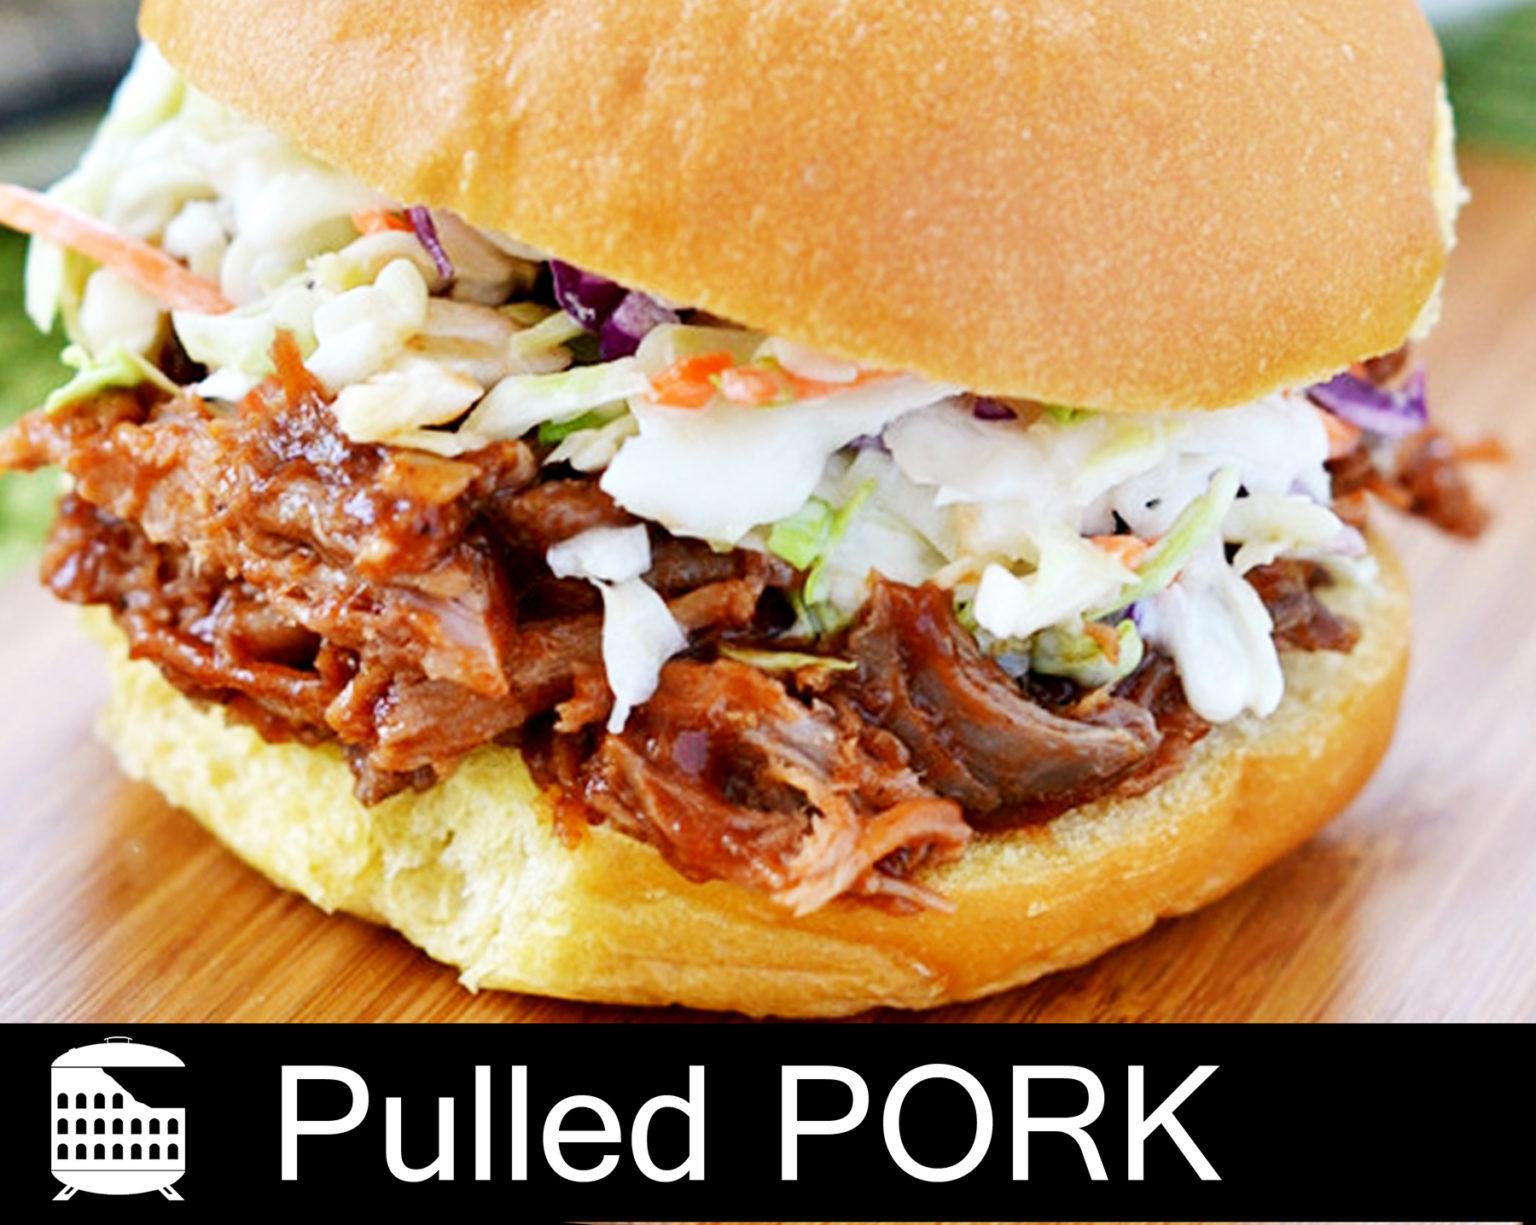 spqr_menu_pulledpork